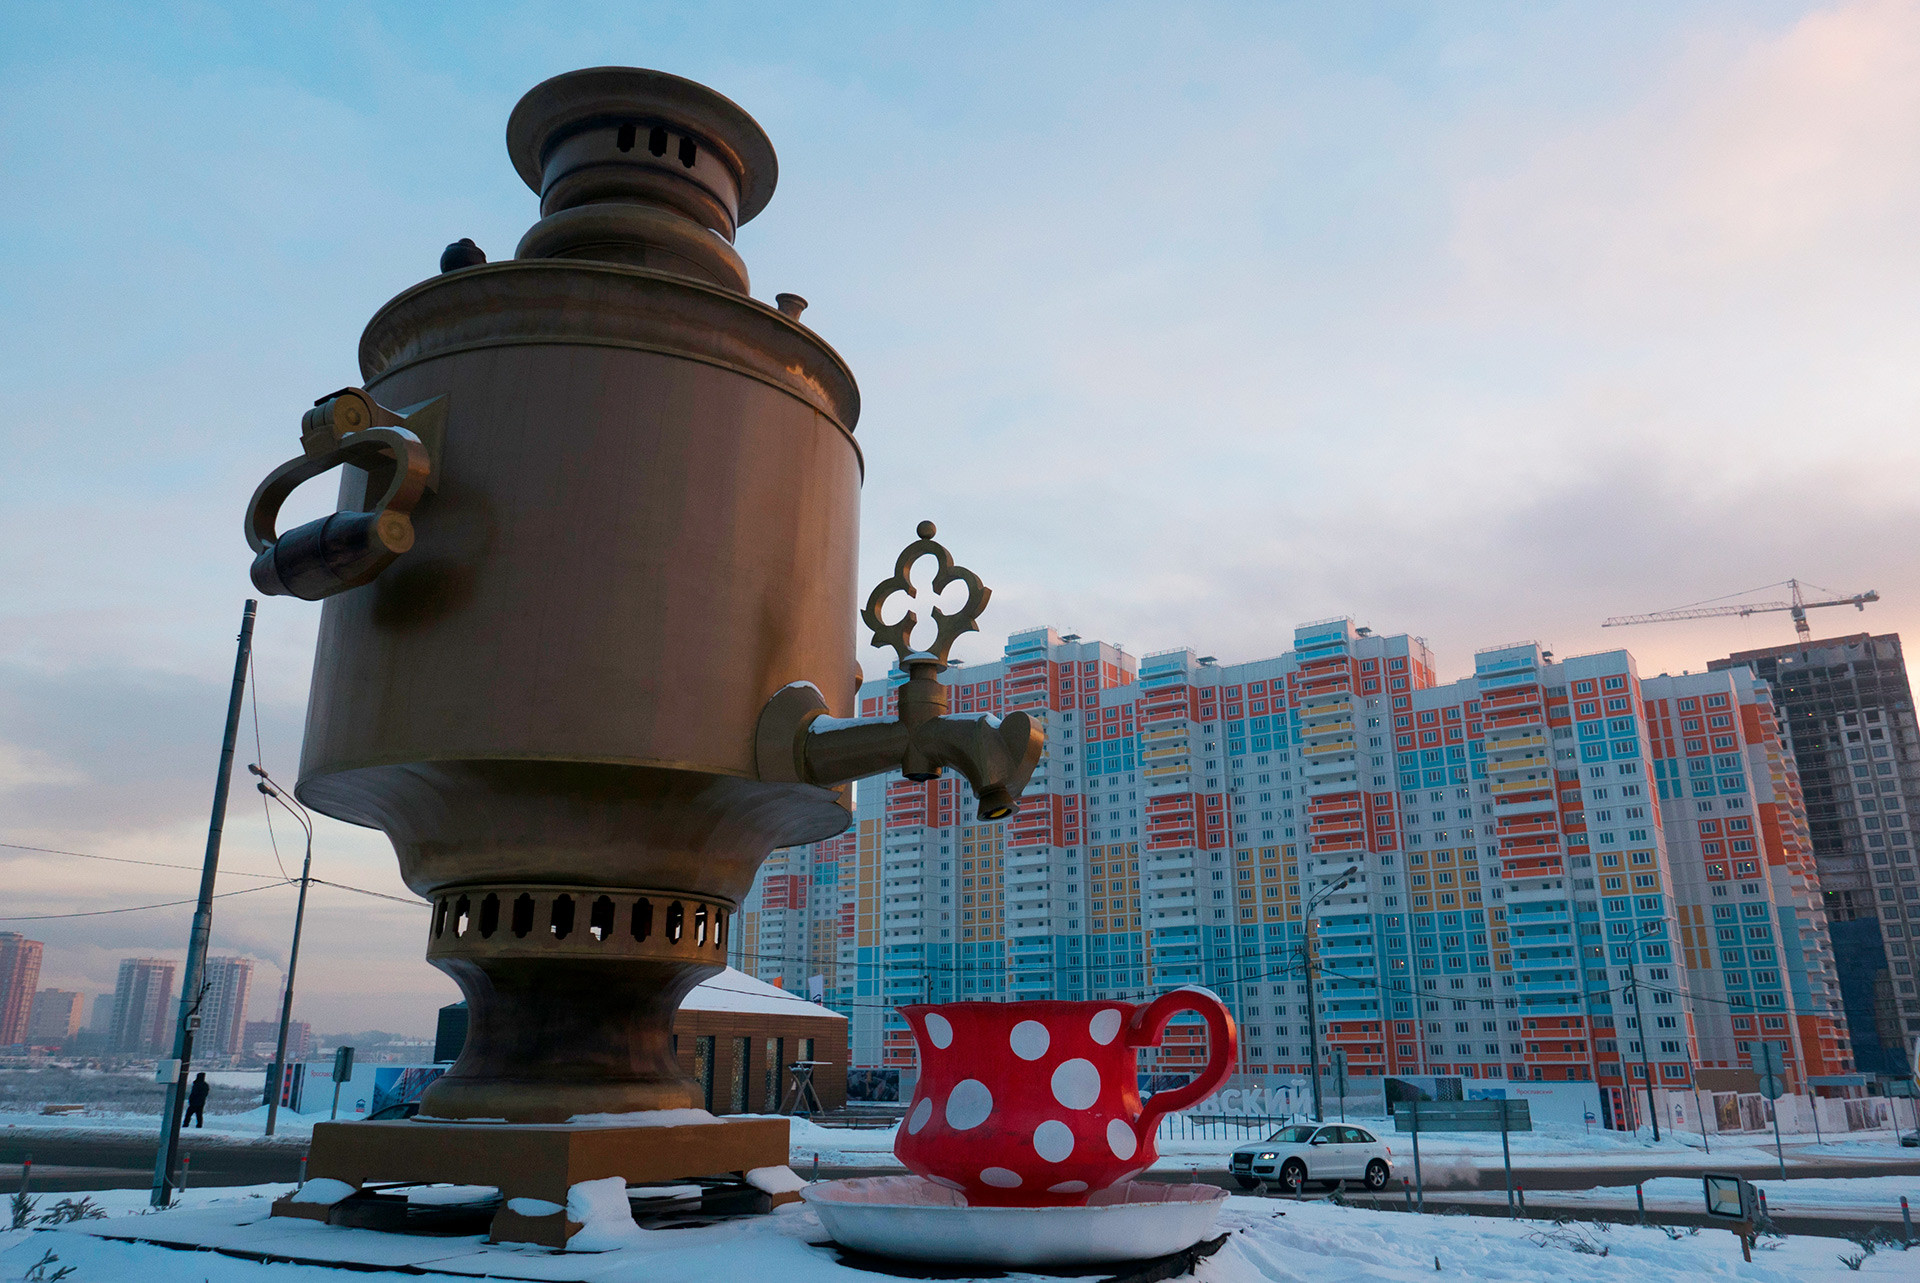 Monumento a samovar de 8 metros en Mitishchi, región de Moscú.